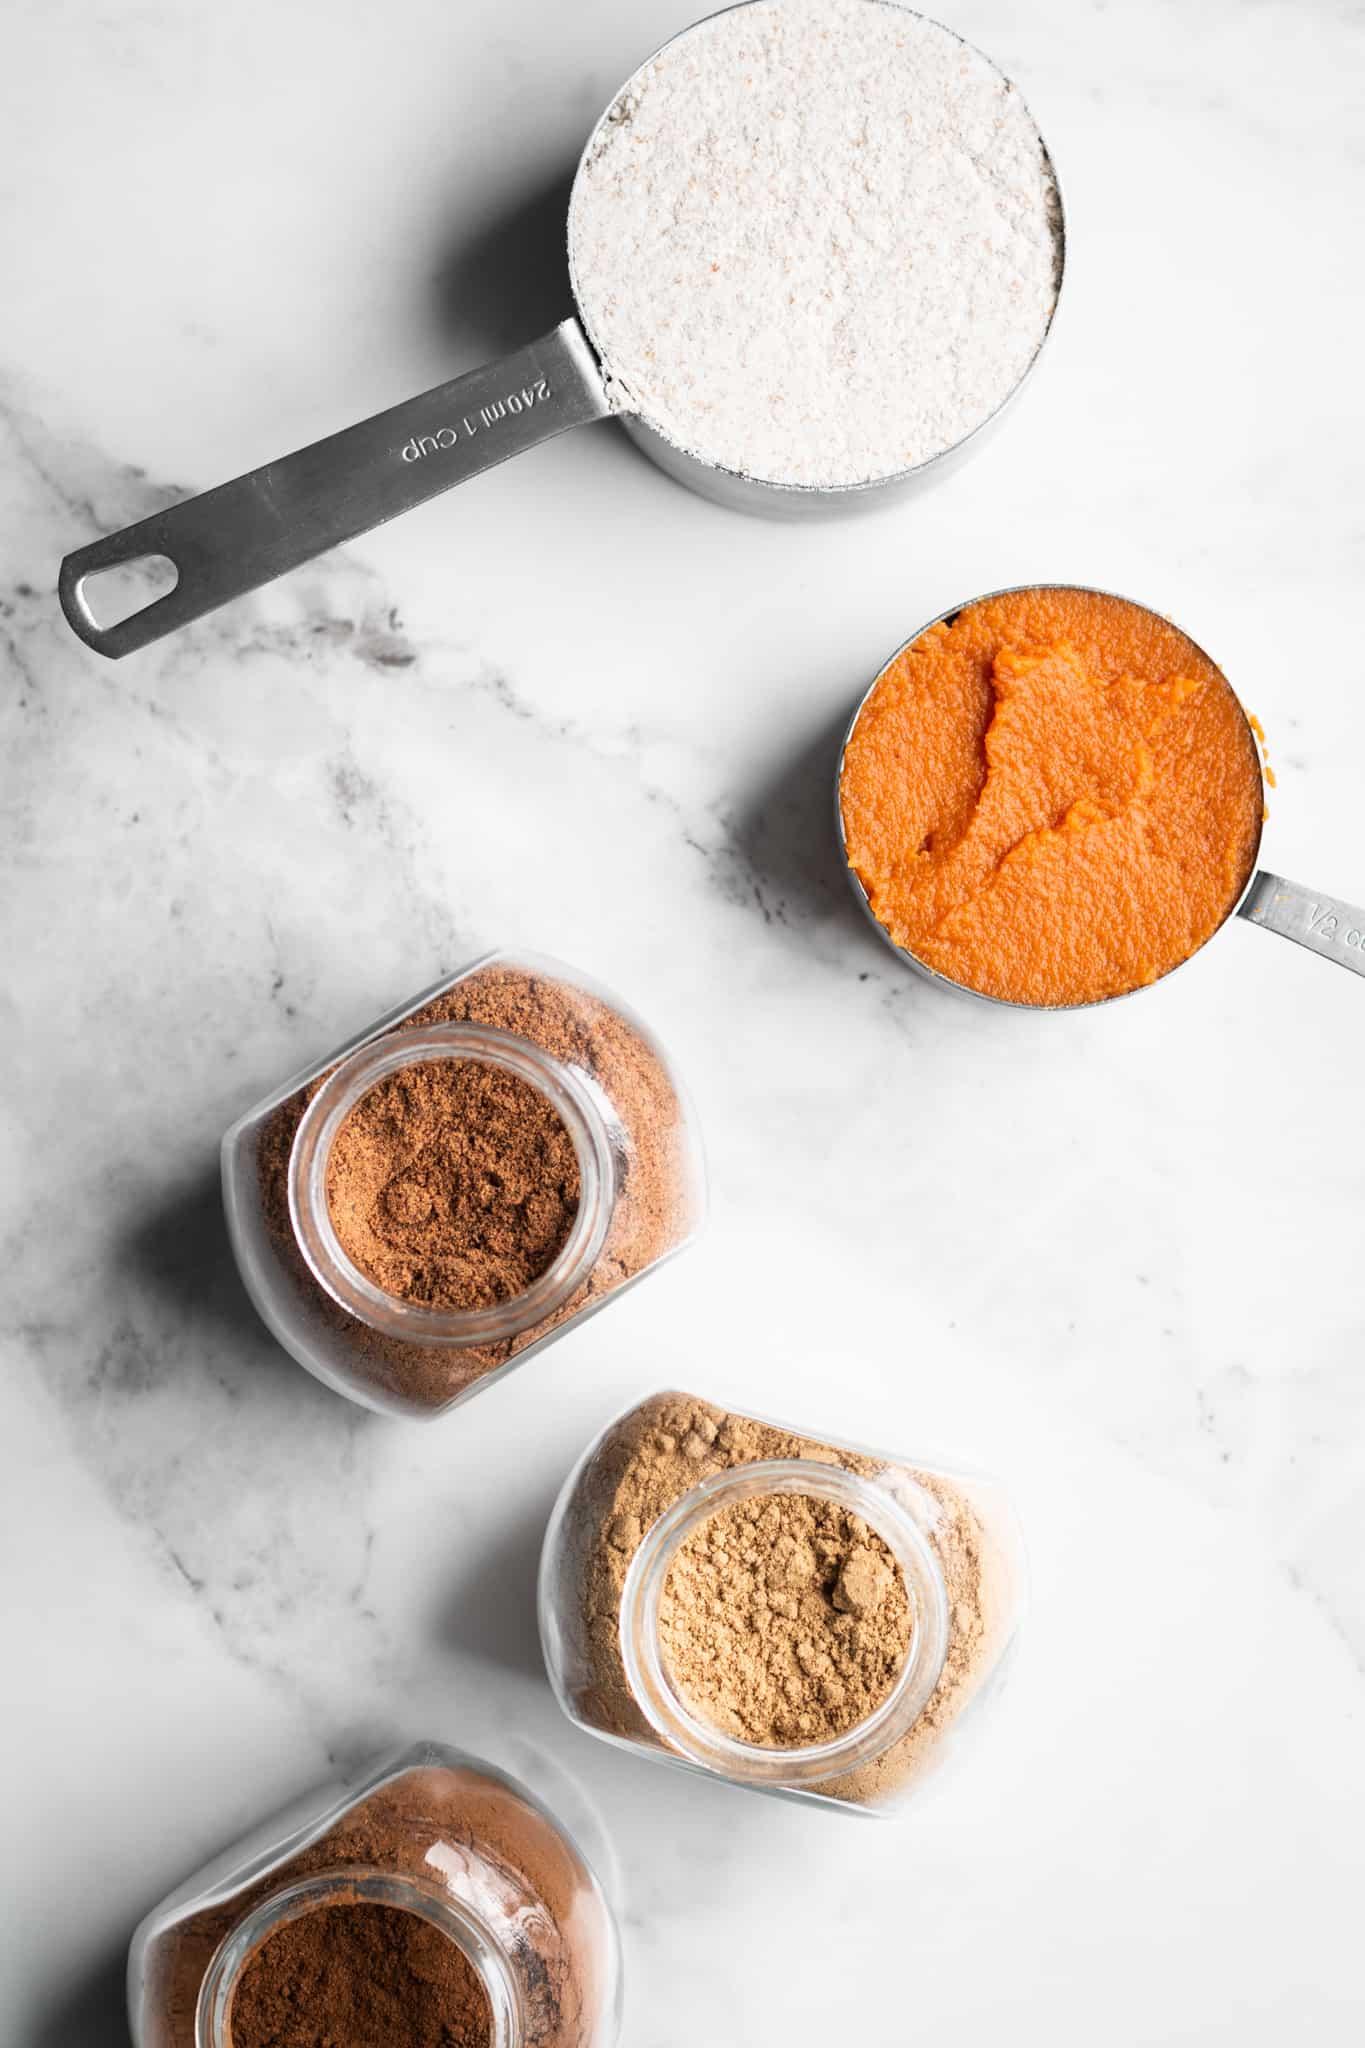 flour, pumpkin puree and spices